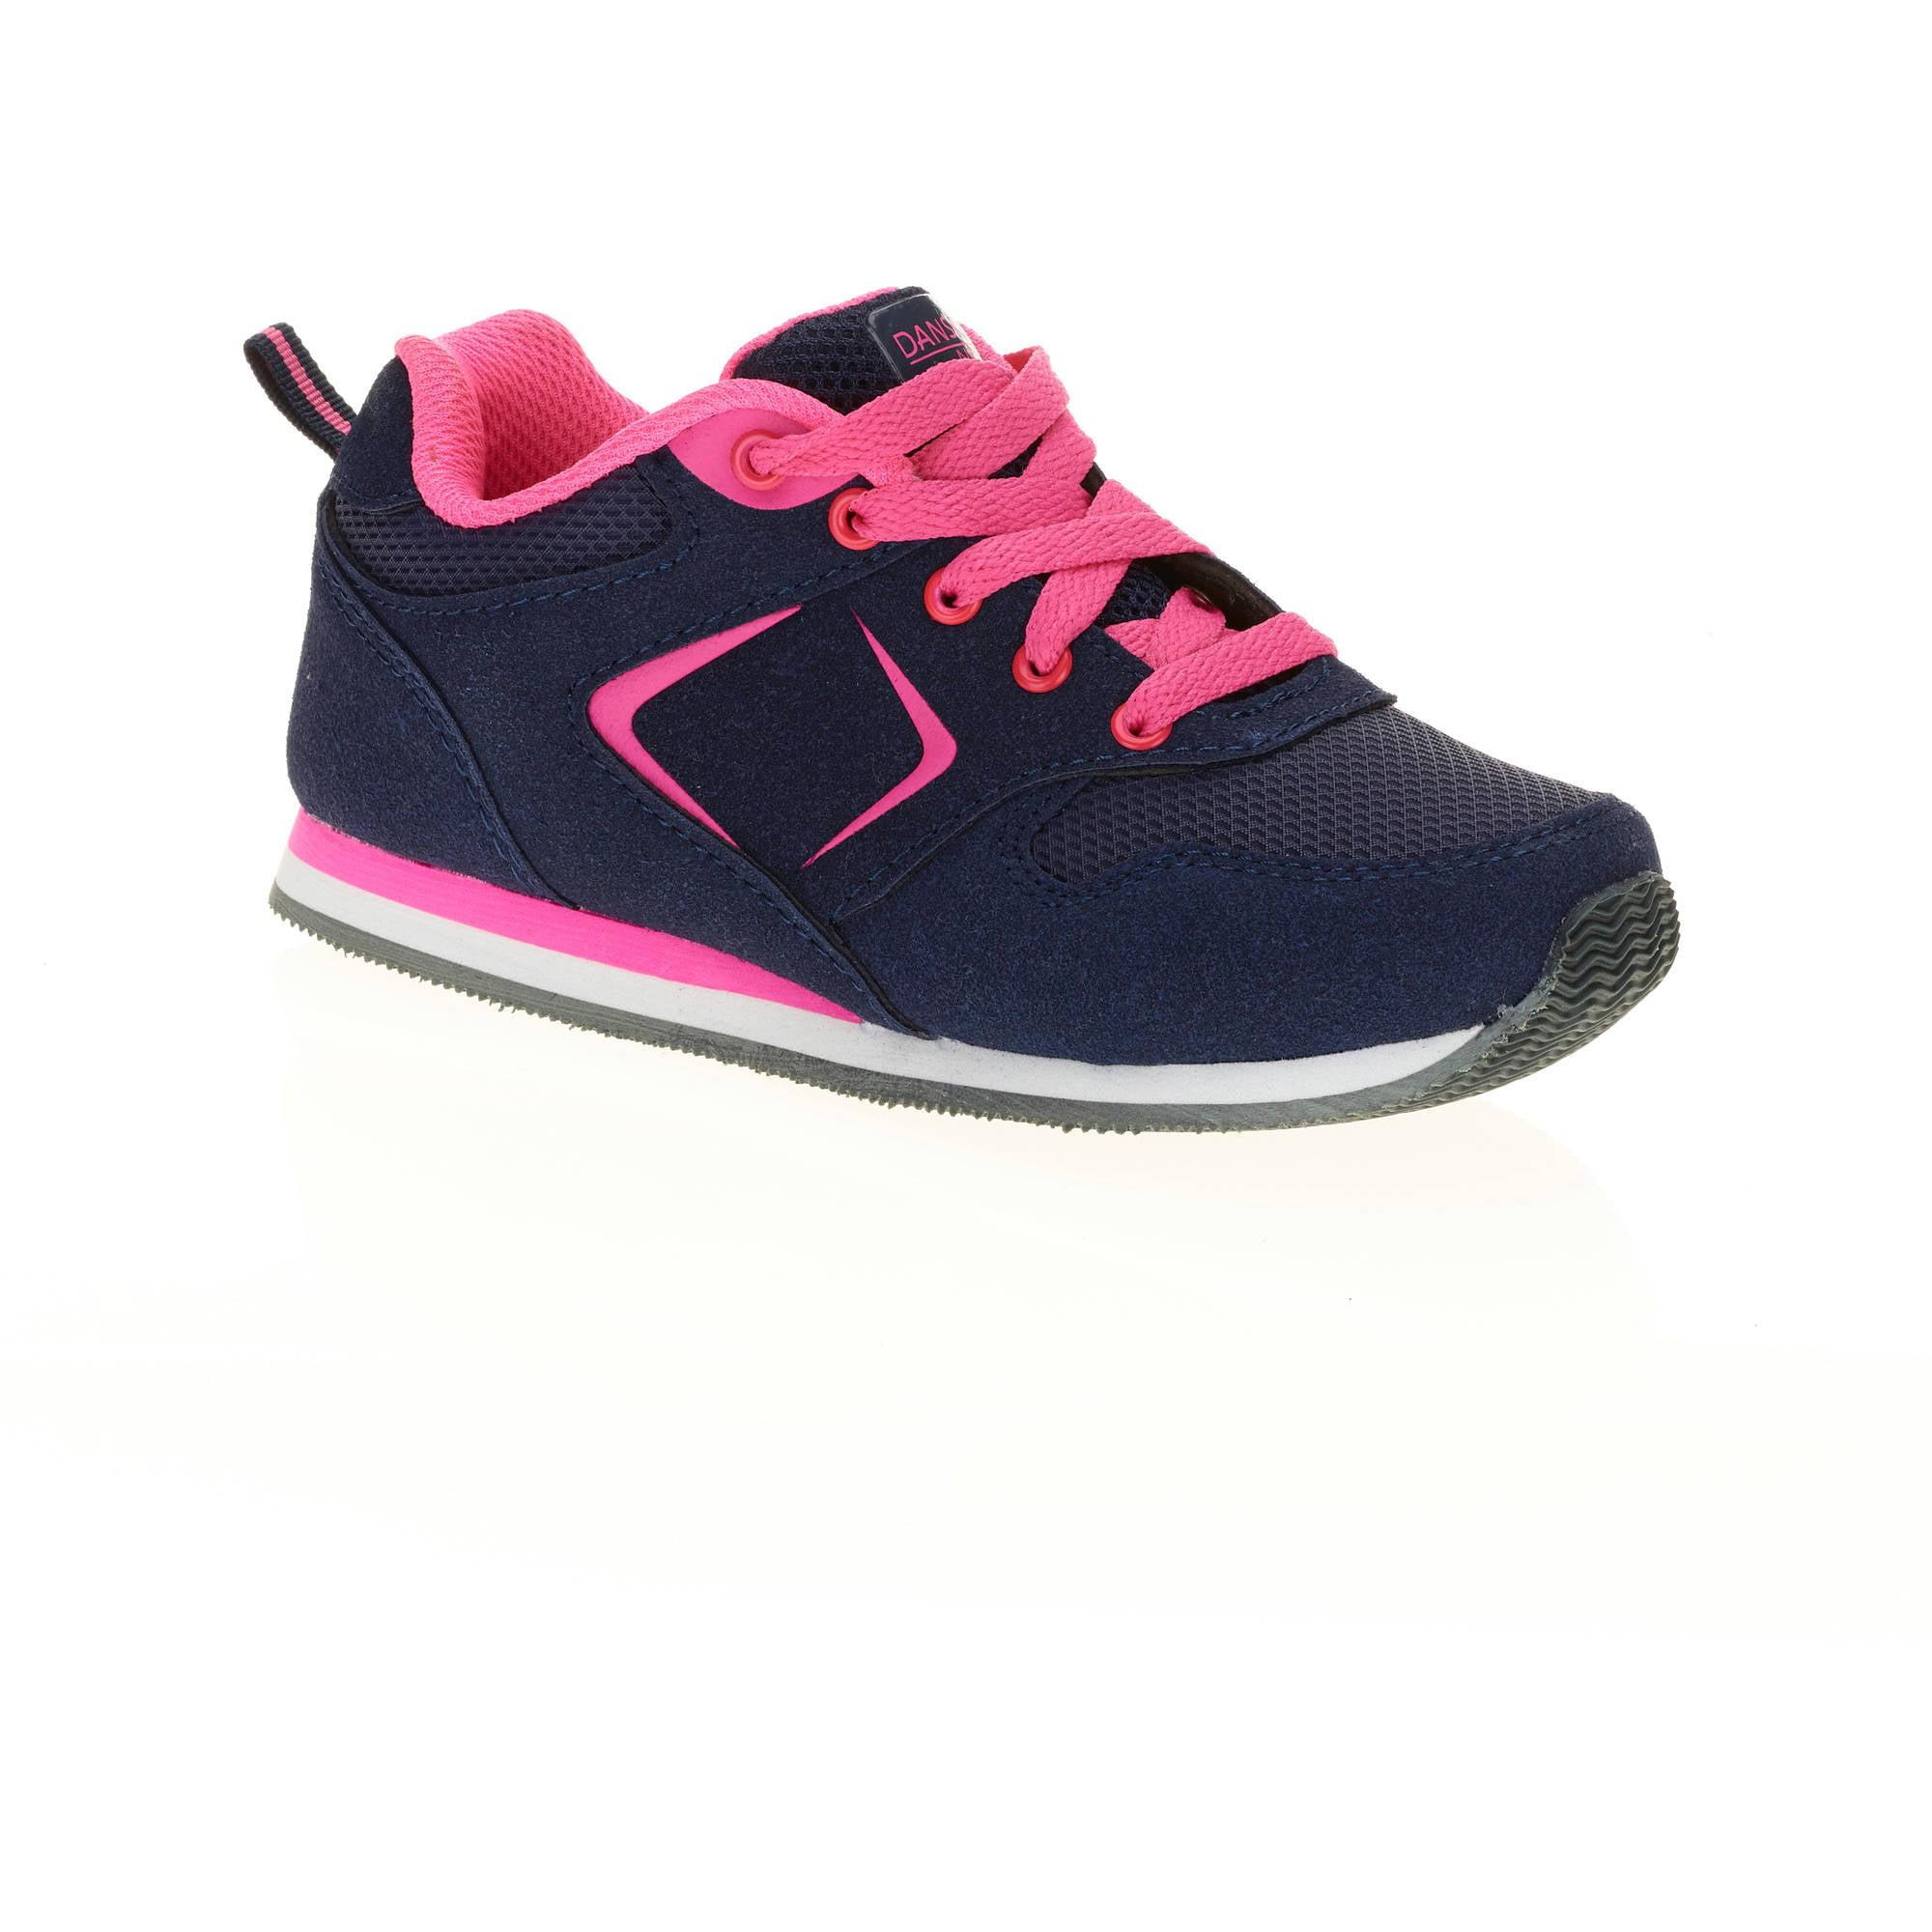 Danskin Now Girls' Running Shoe by